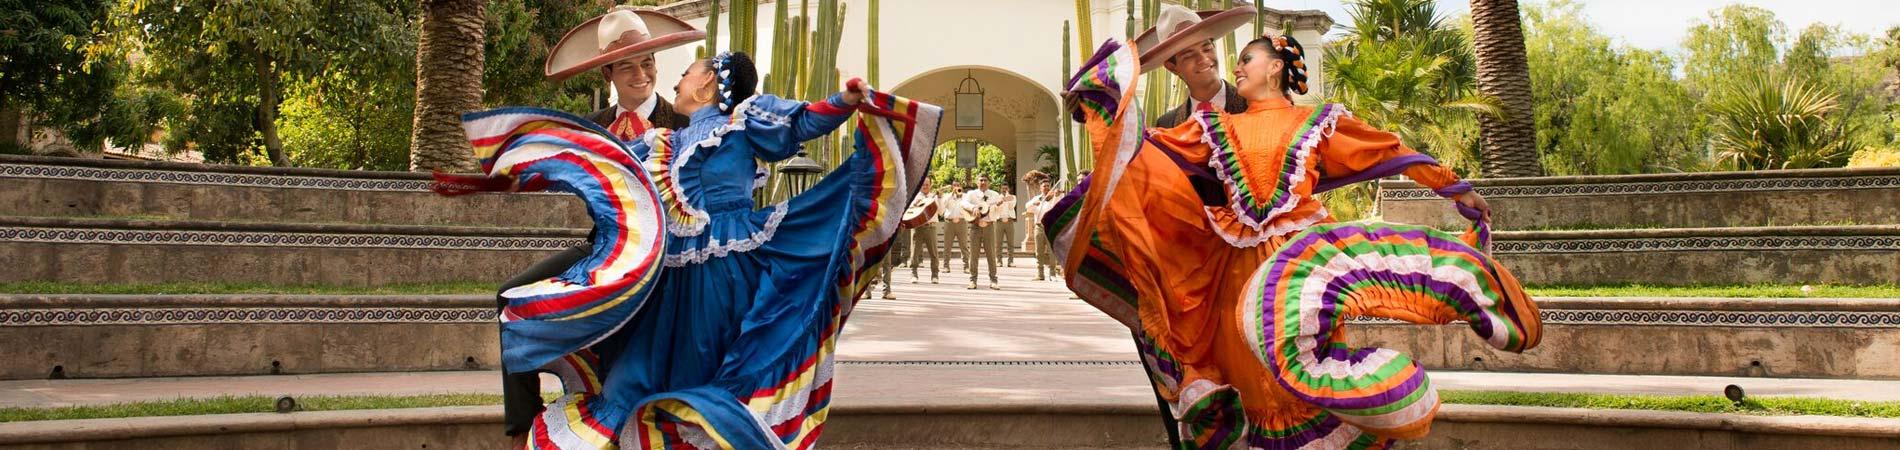 San Miguel De Allende Amp Tequila Experience Journey Mexico